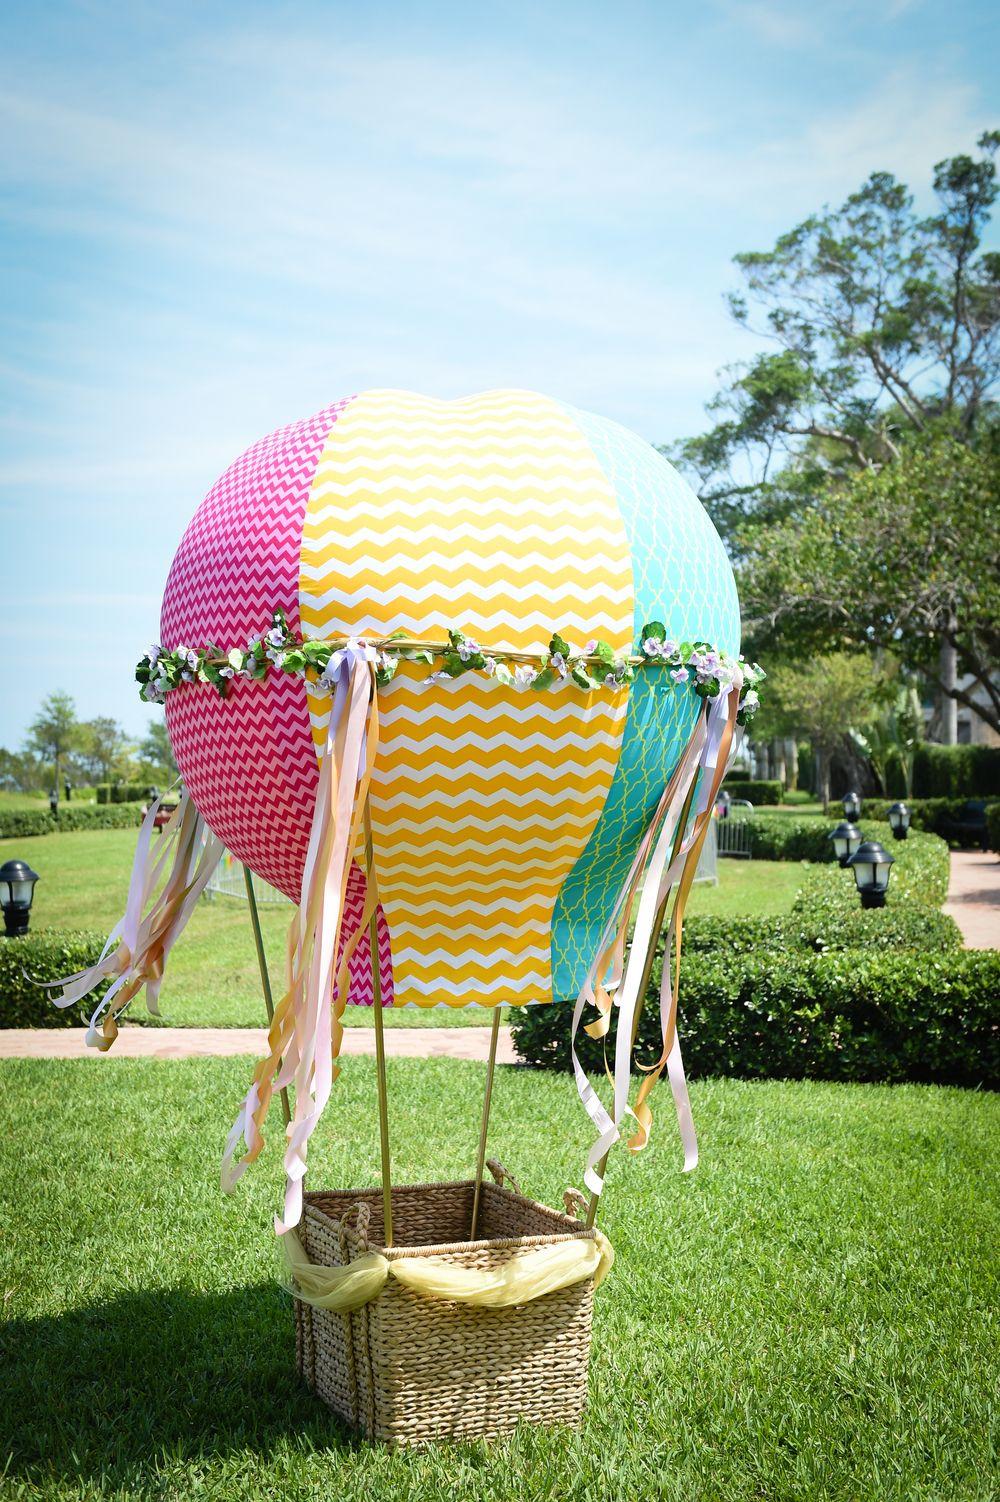 Pin about Diy hot air balloons and Hot air balloon on Ximena